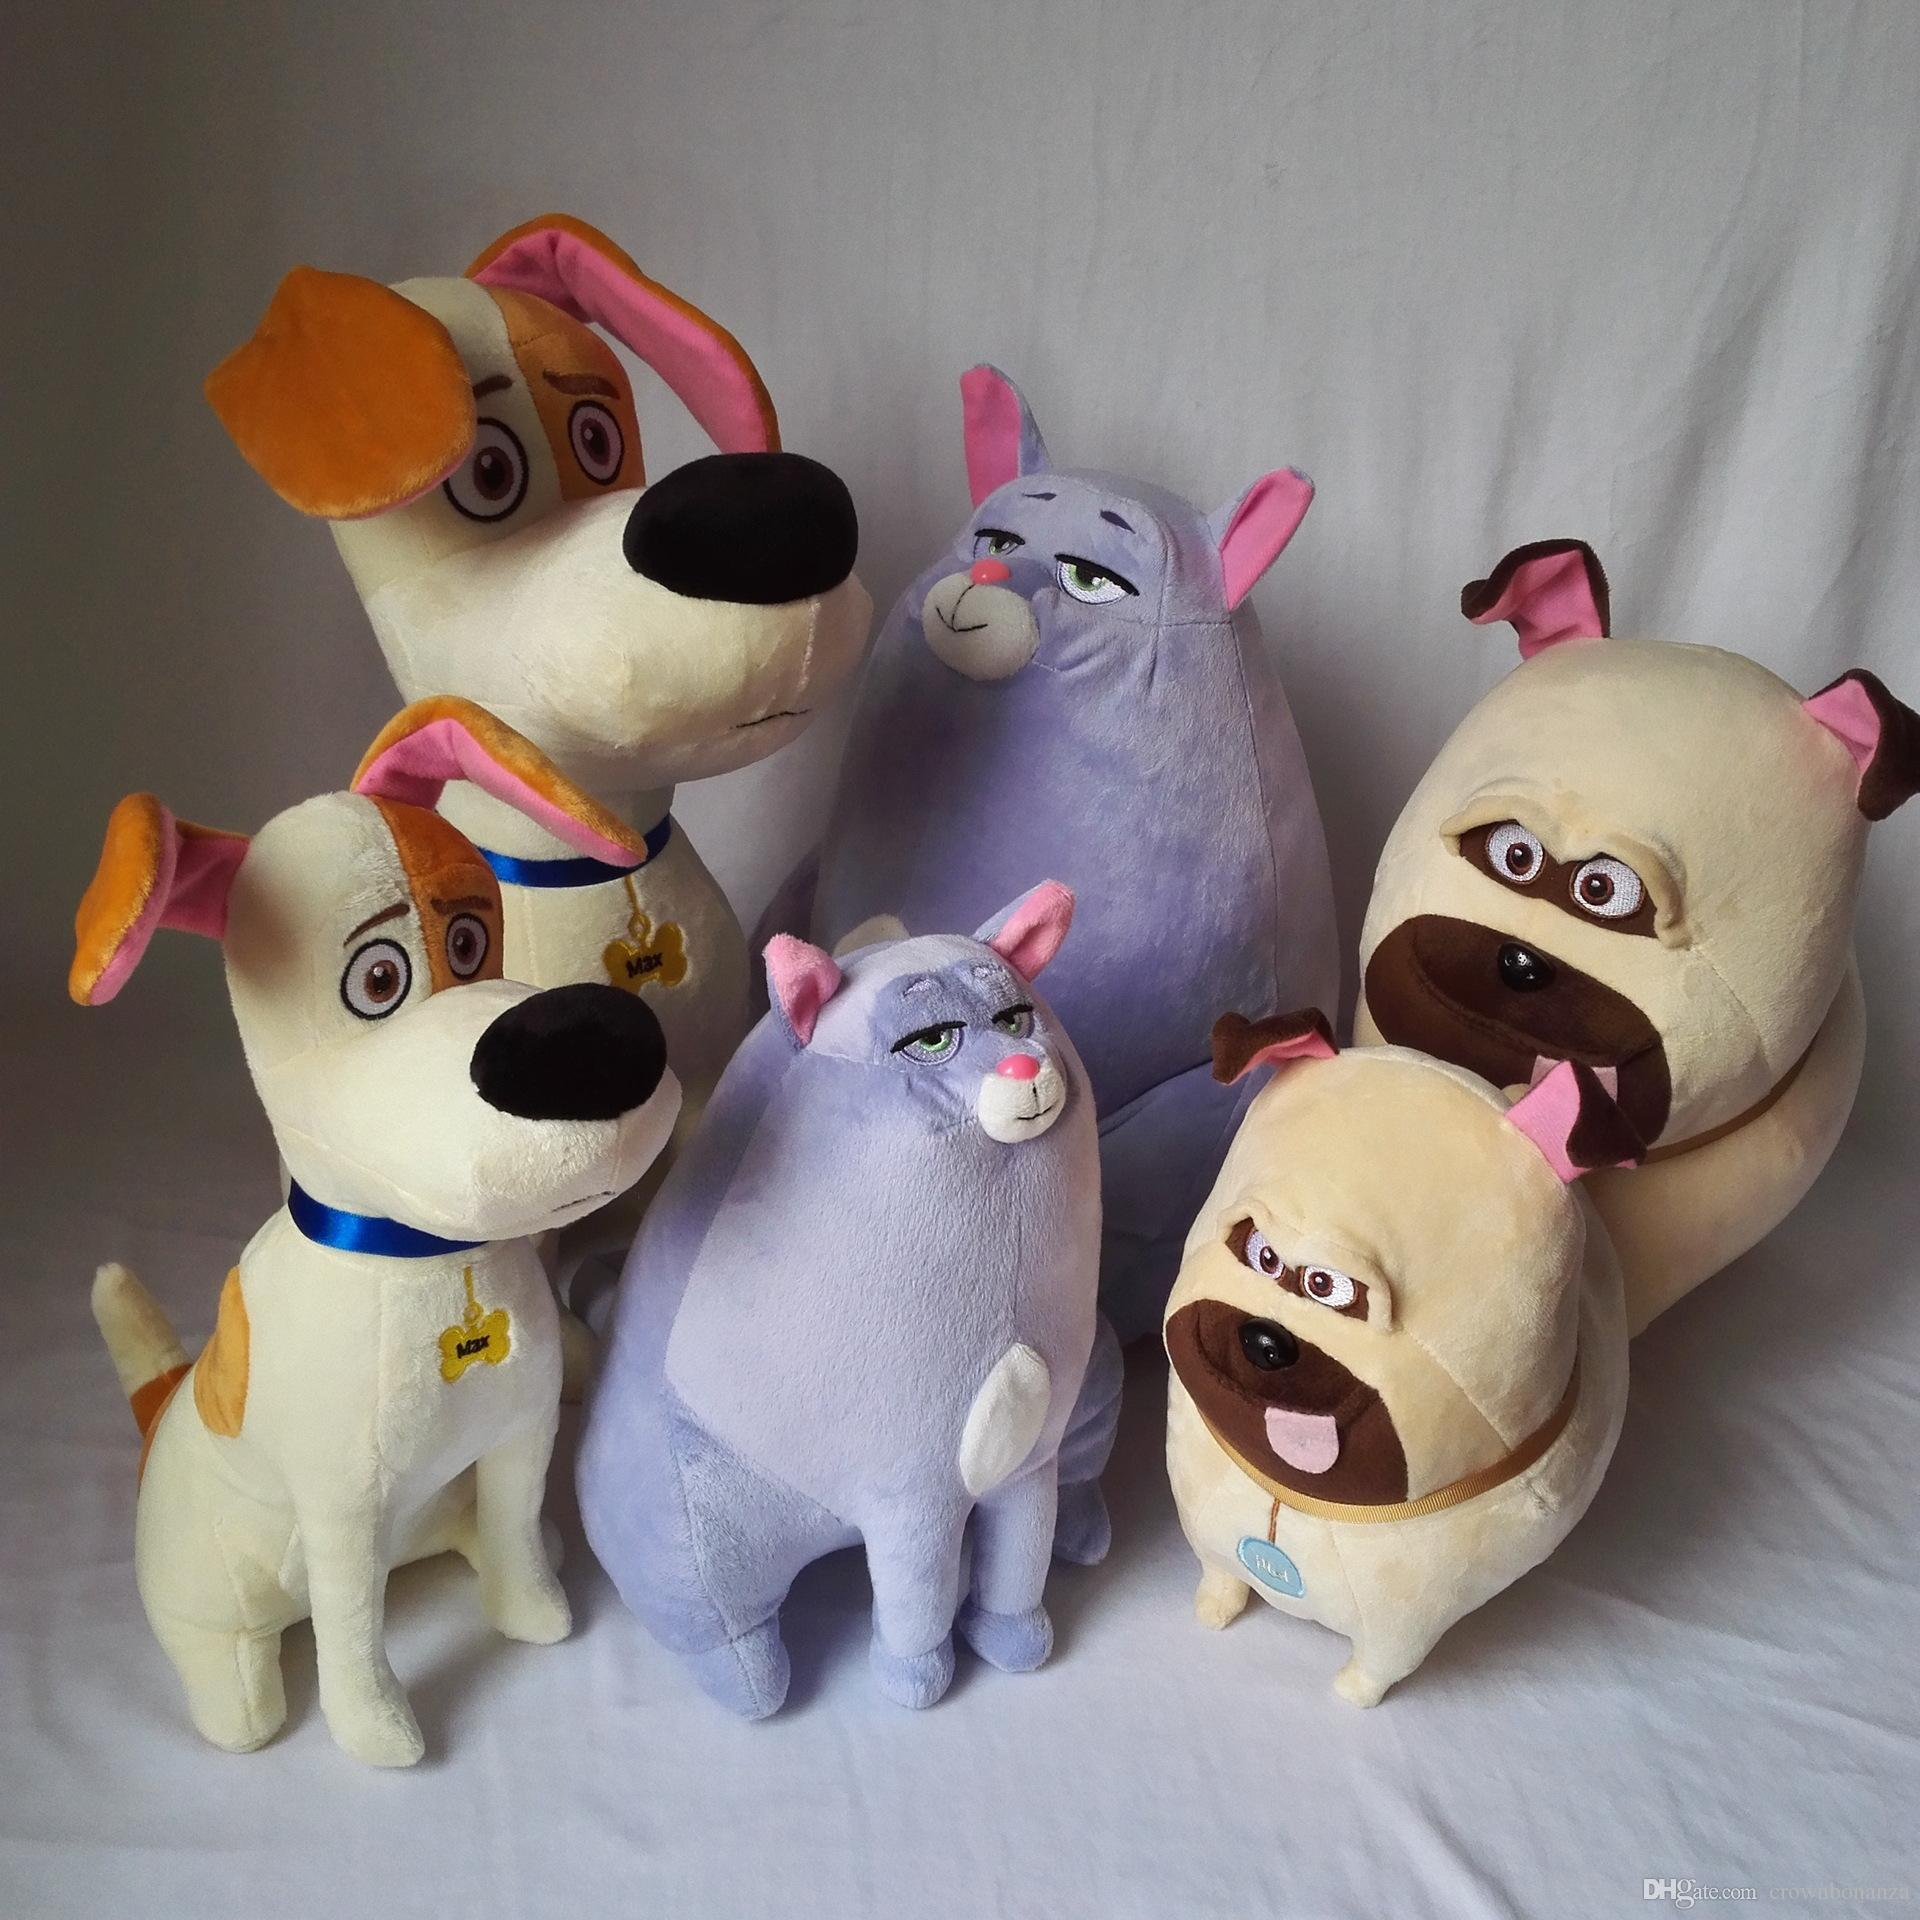 25CM The secret life of pets Plush toys Max Chloe Snowball bulldog